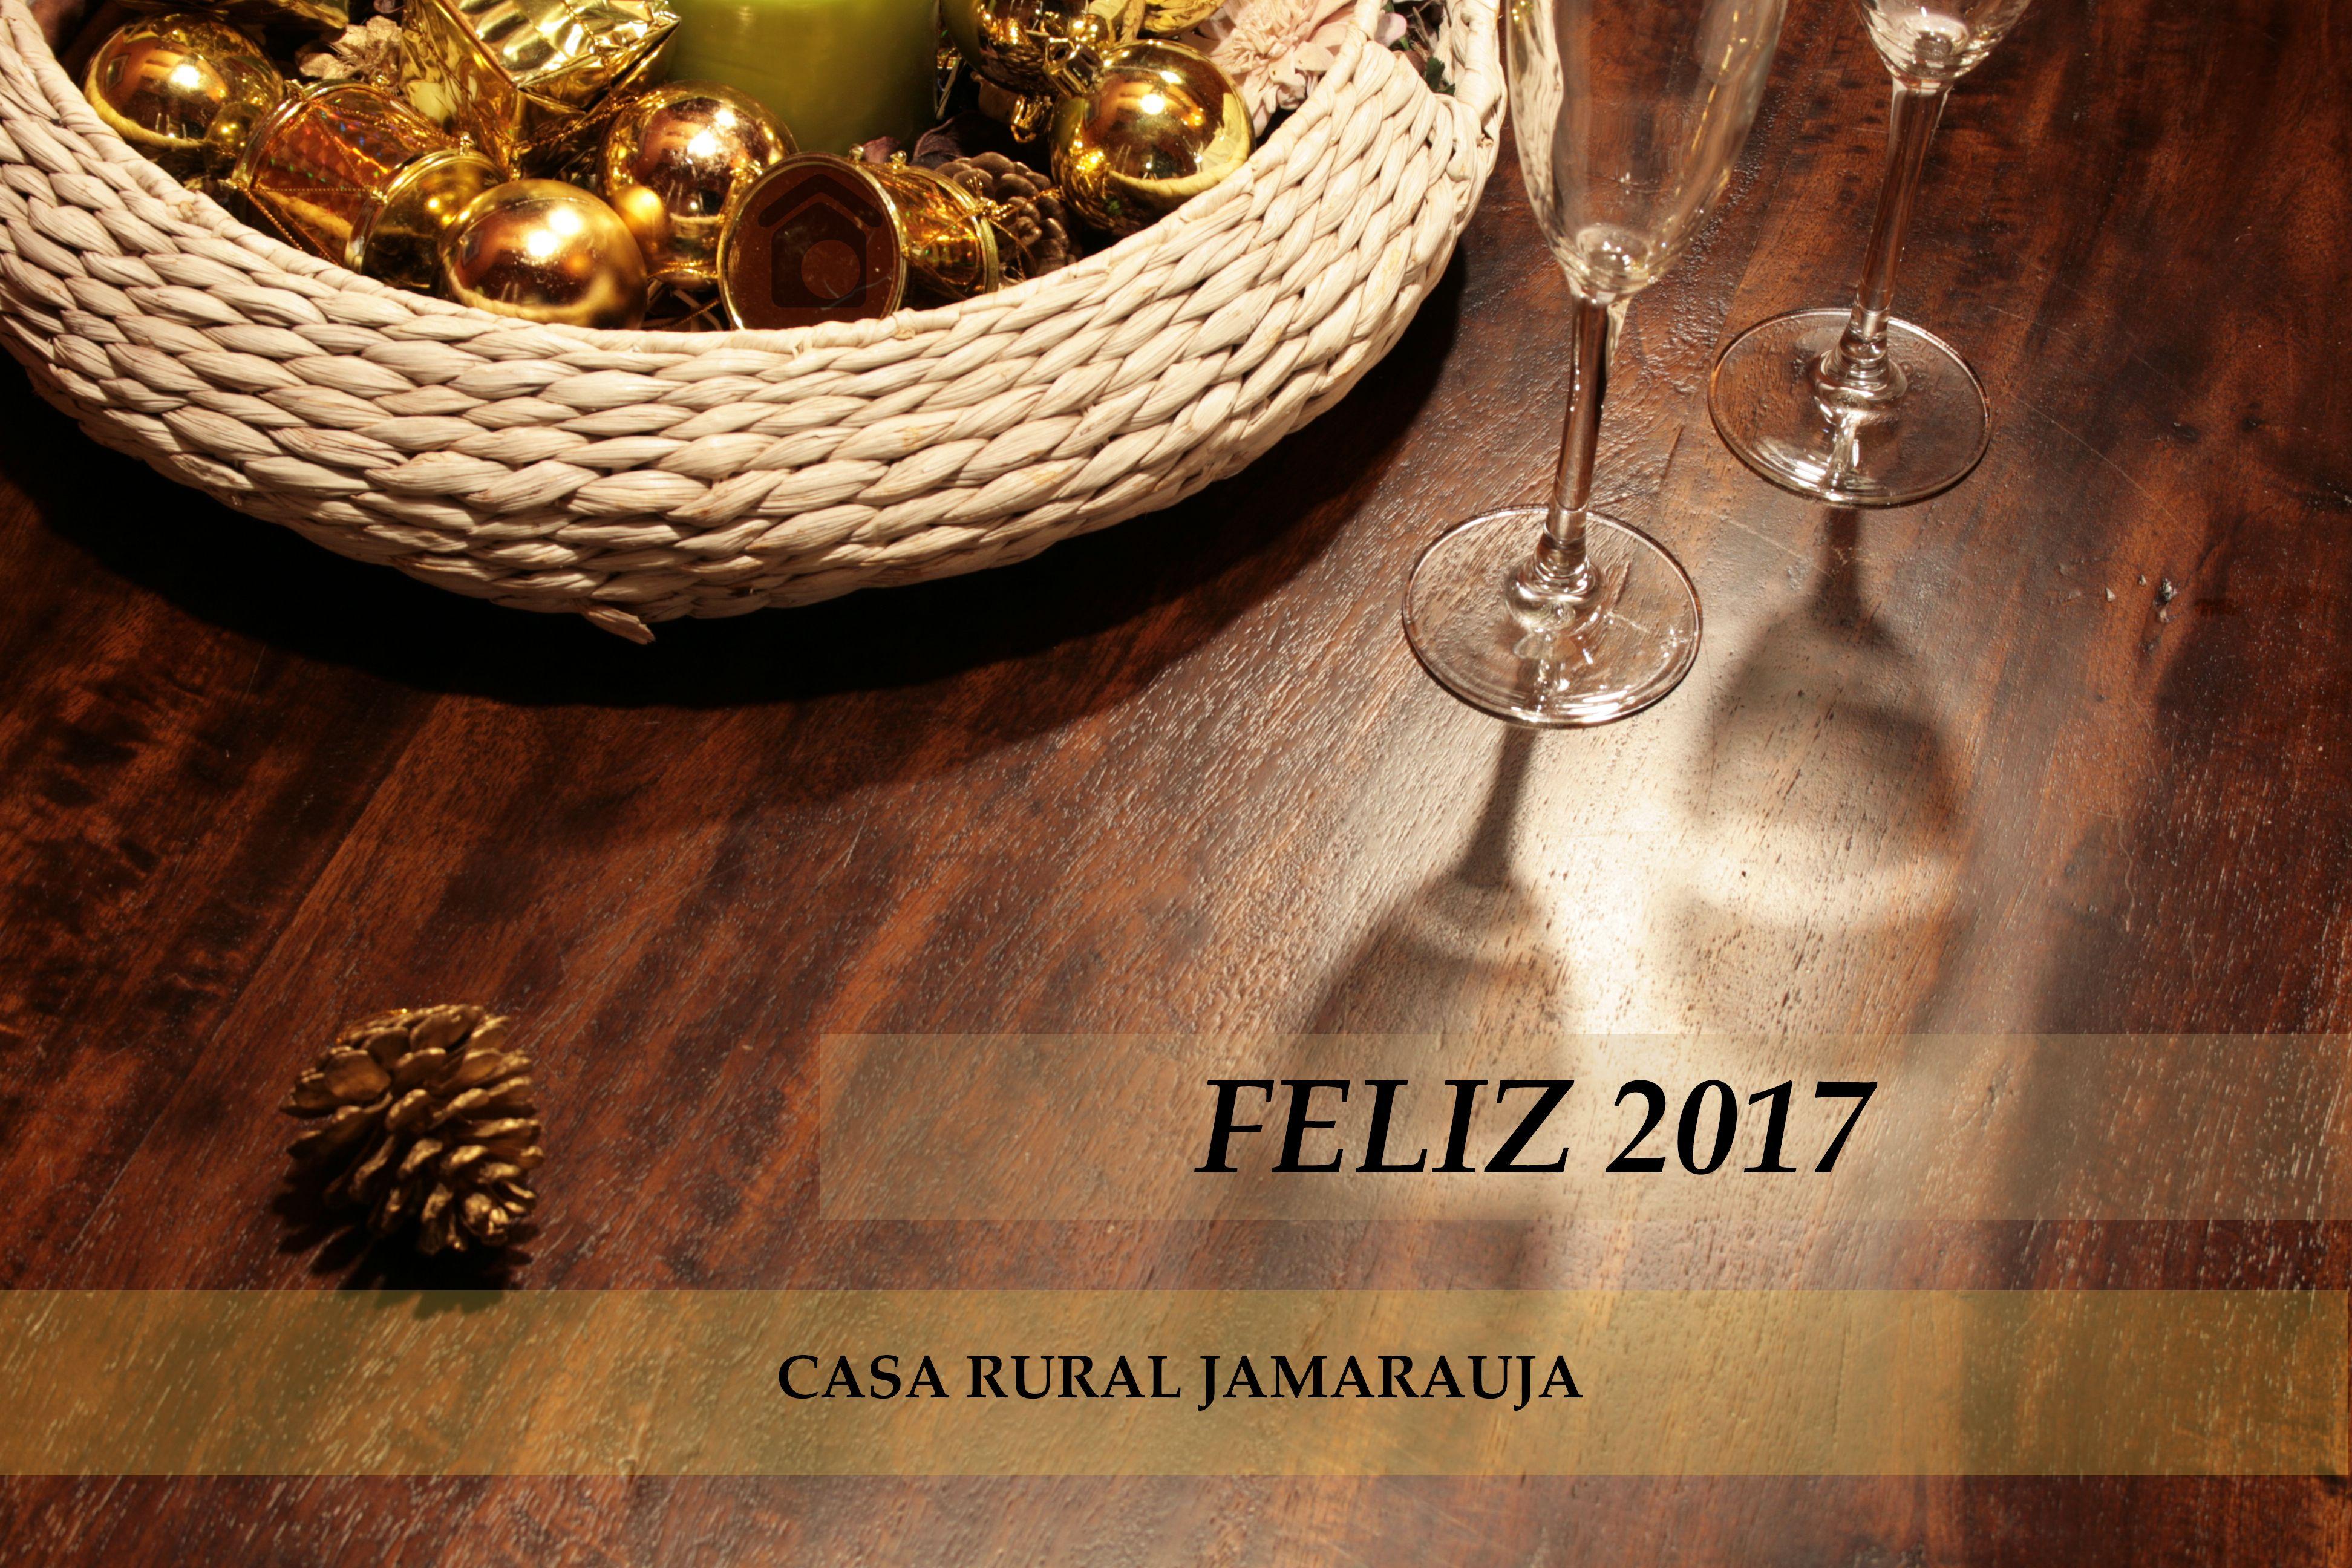 Feliz 2017 desde Jamarauja